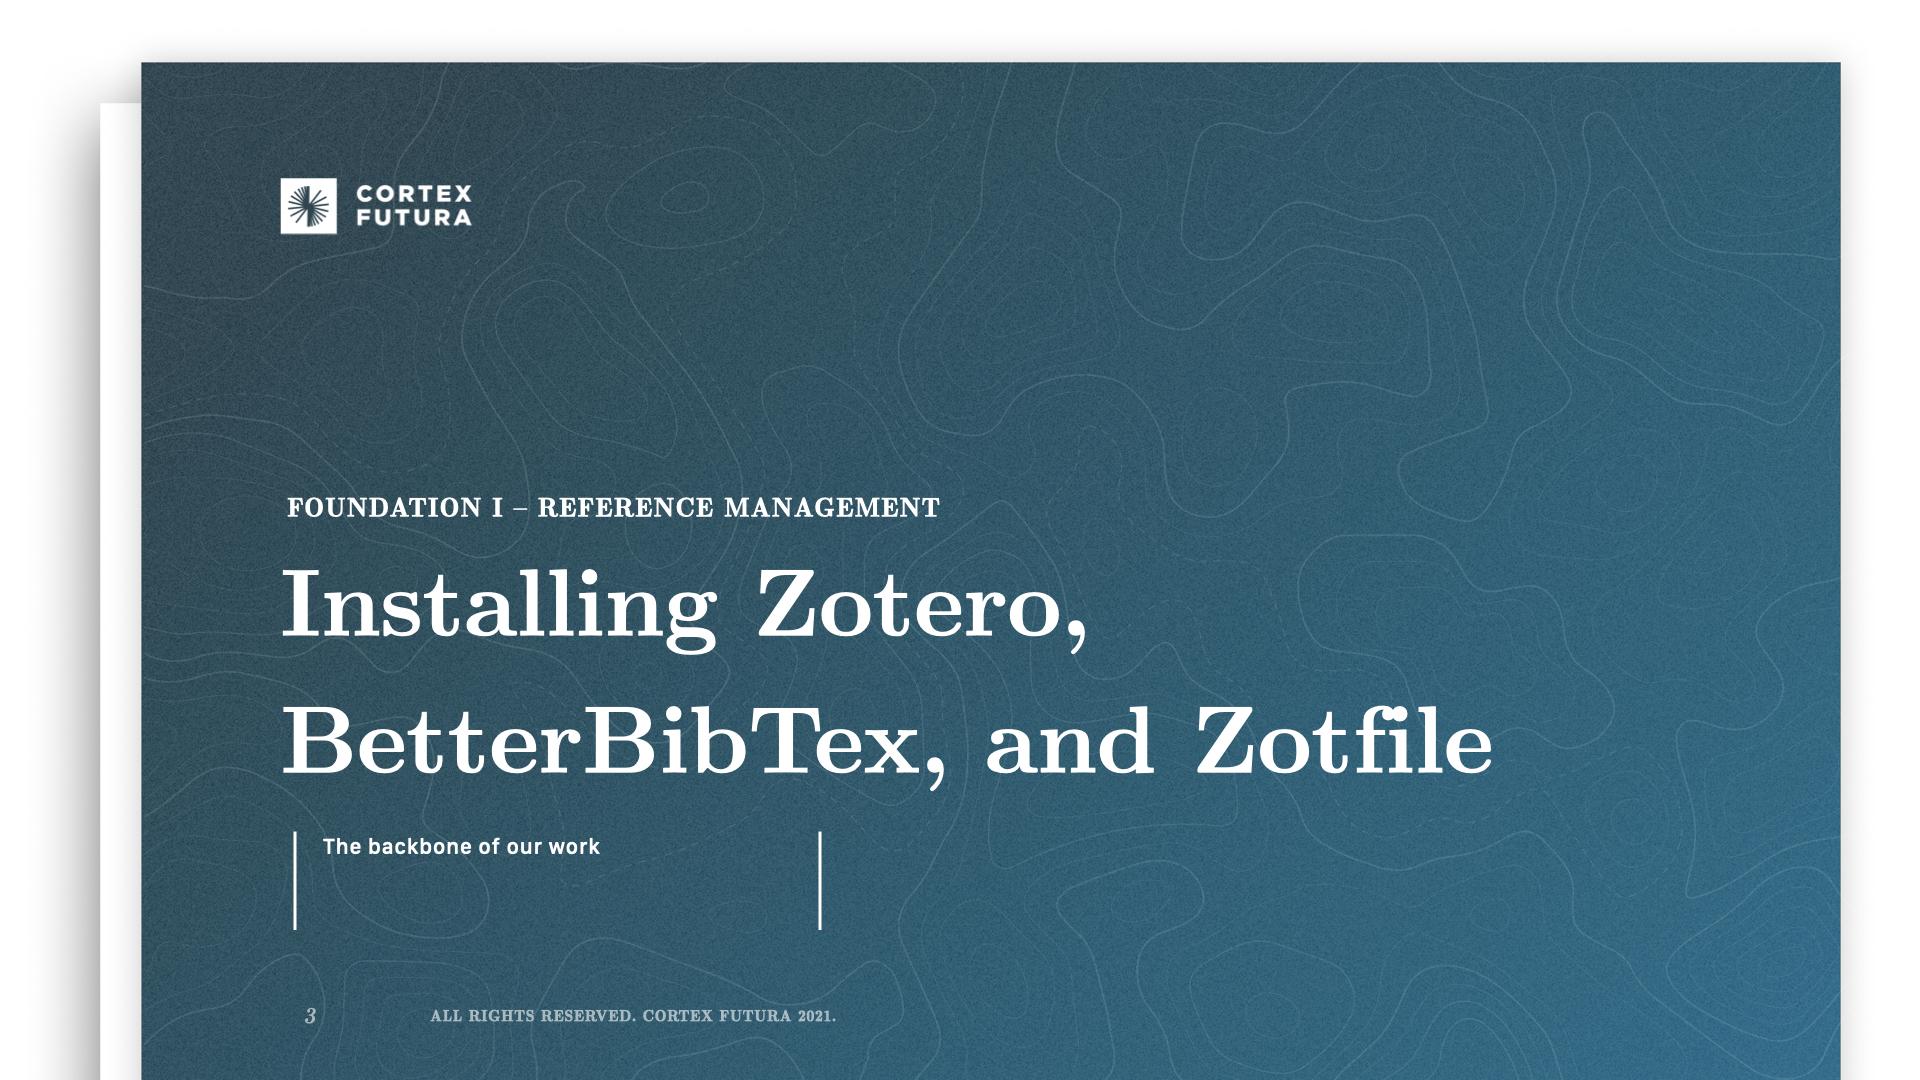 Installing Zotero, BetterBibTex, and Zotfile